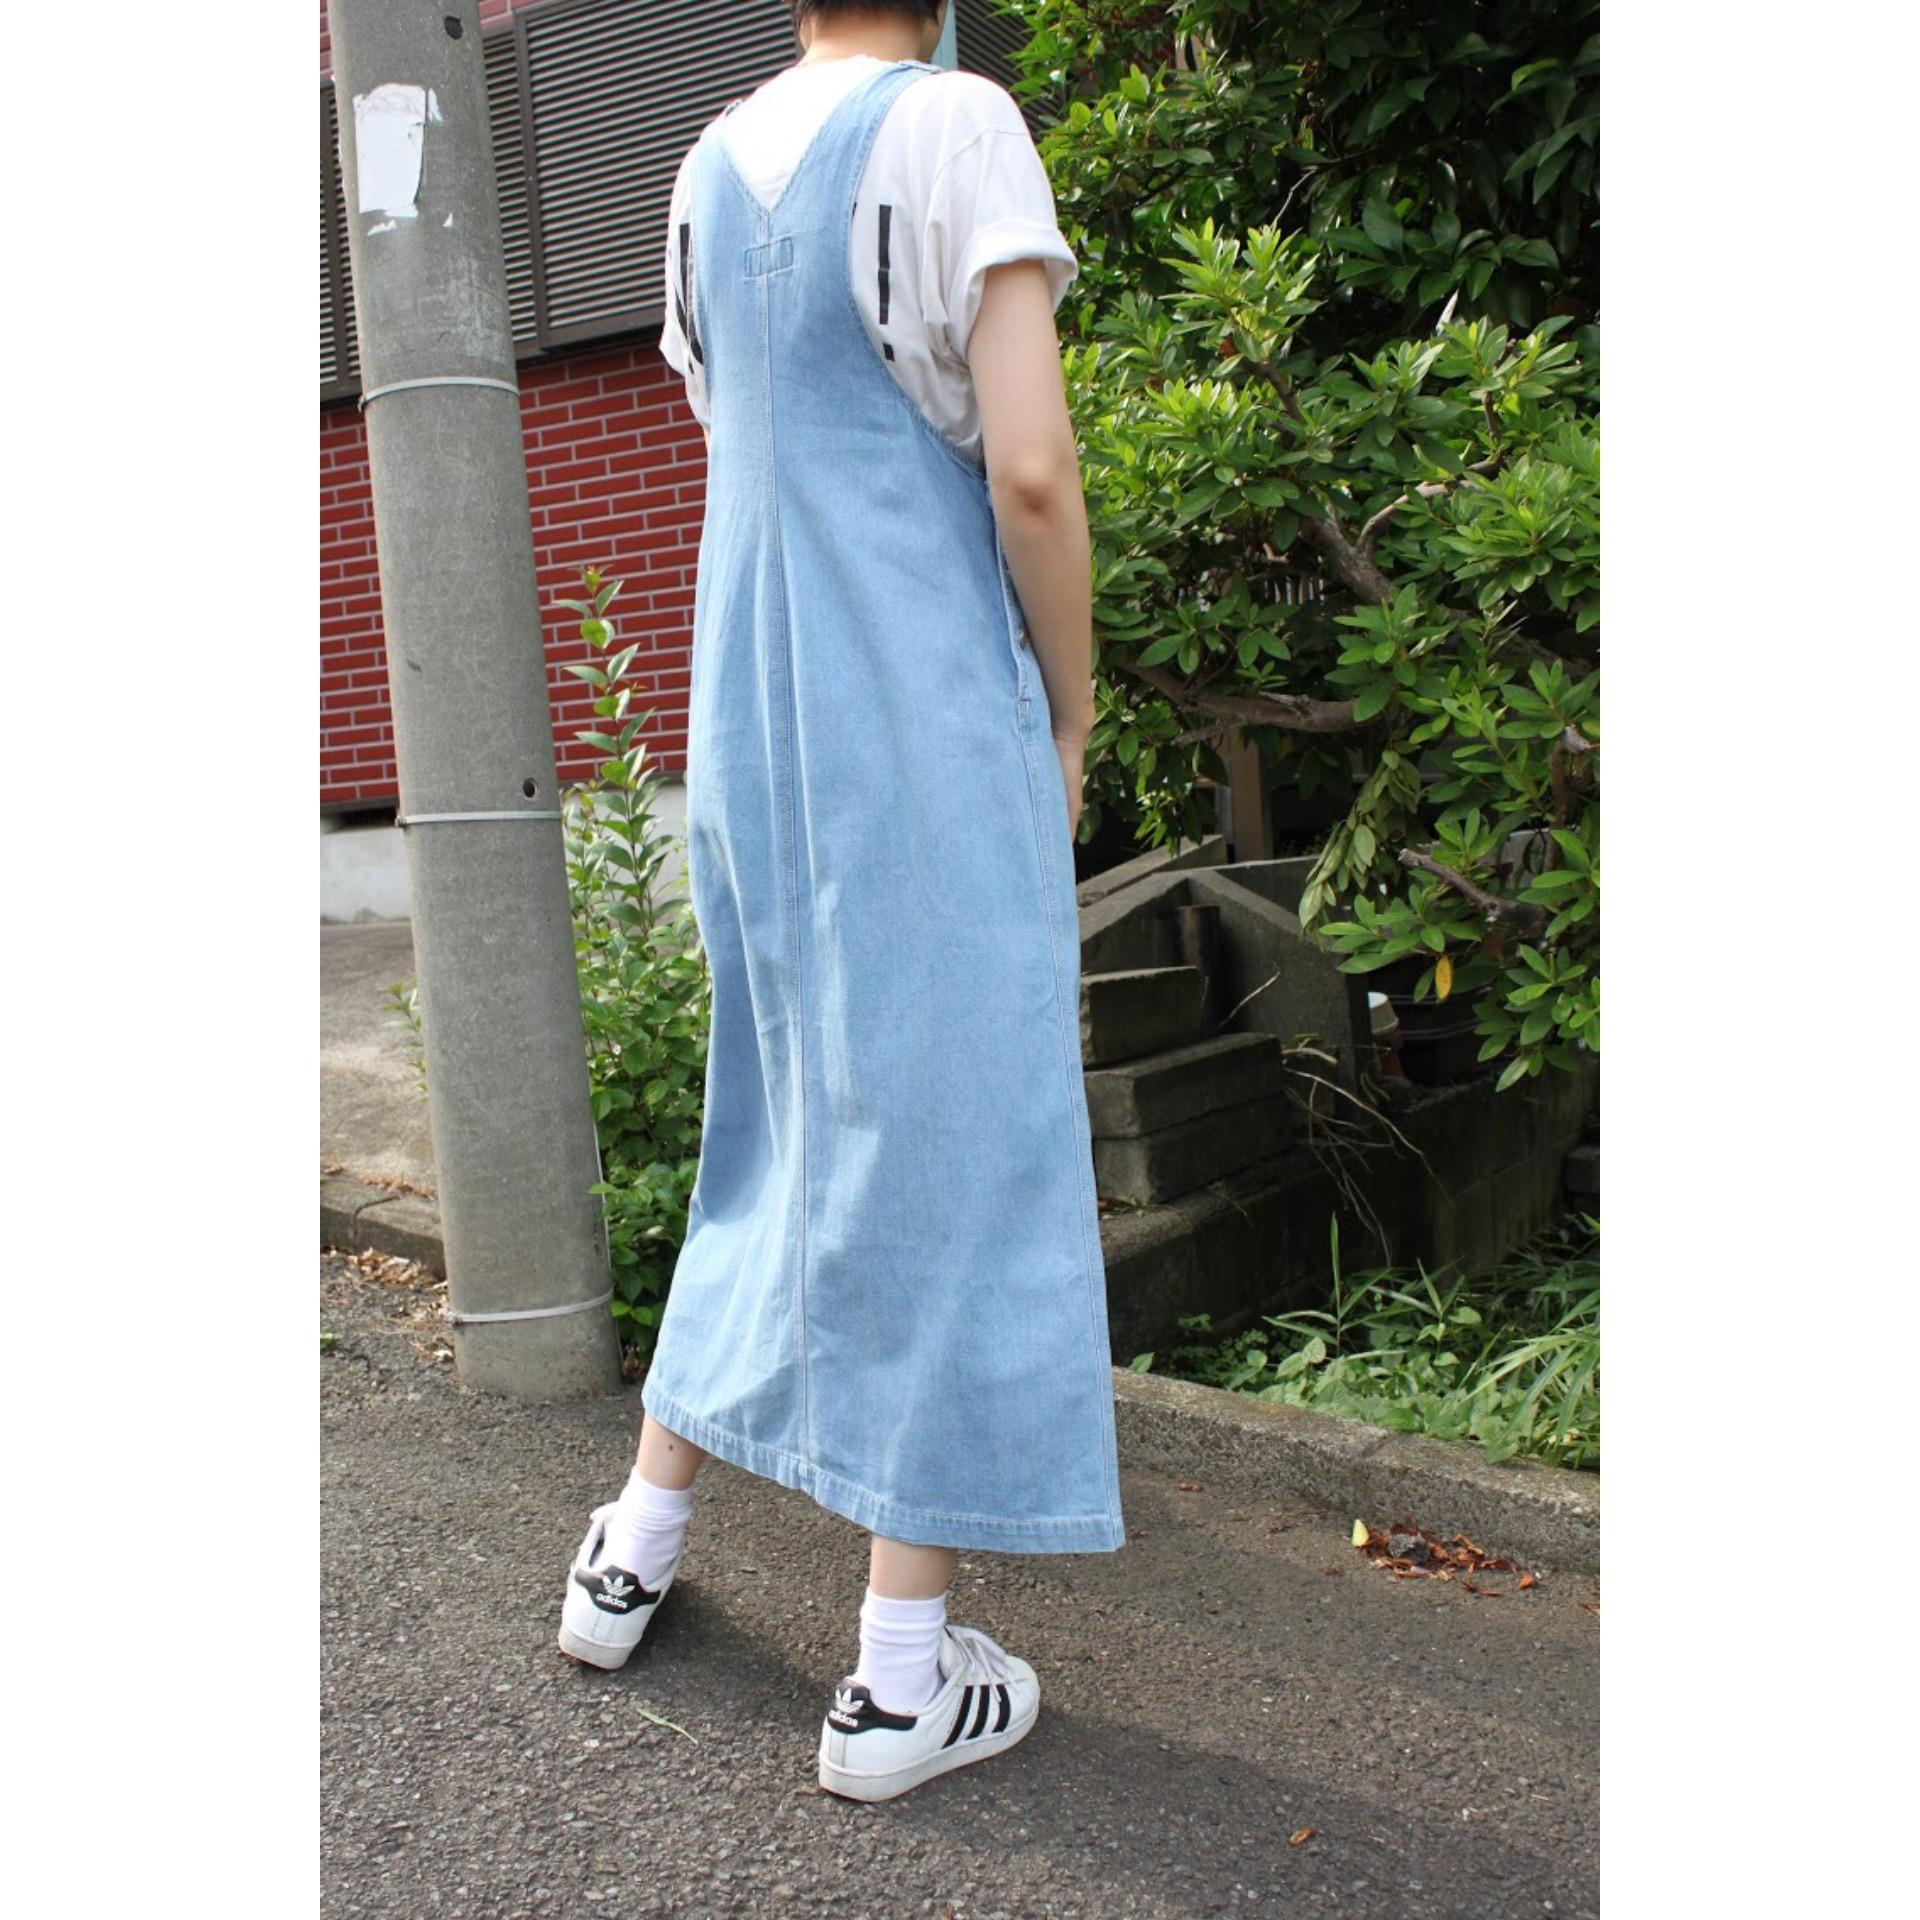 Vintage salopette skirt